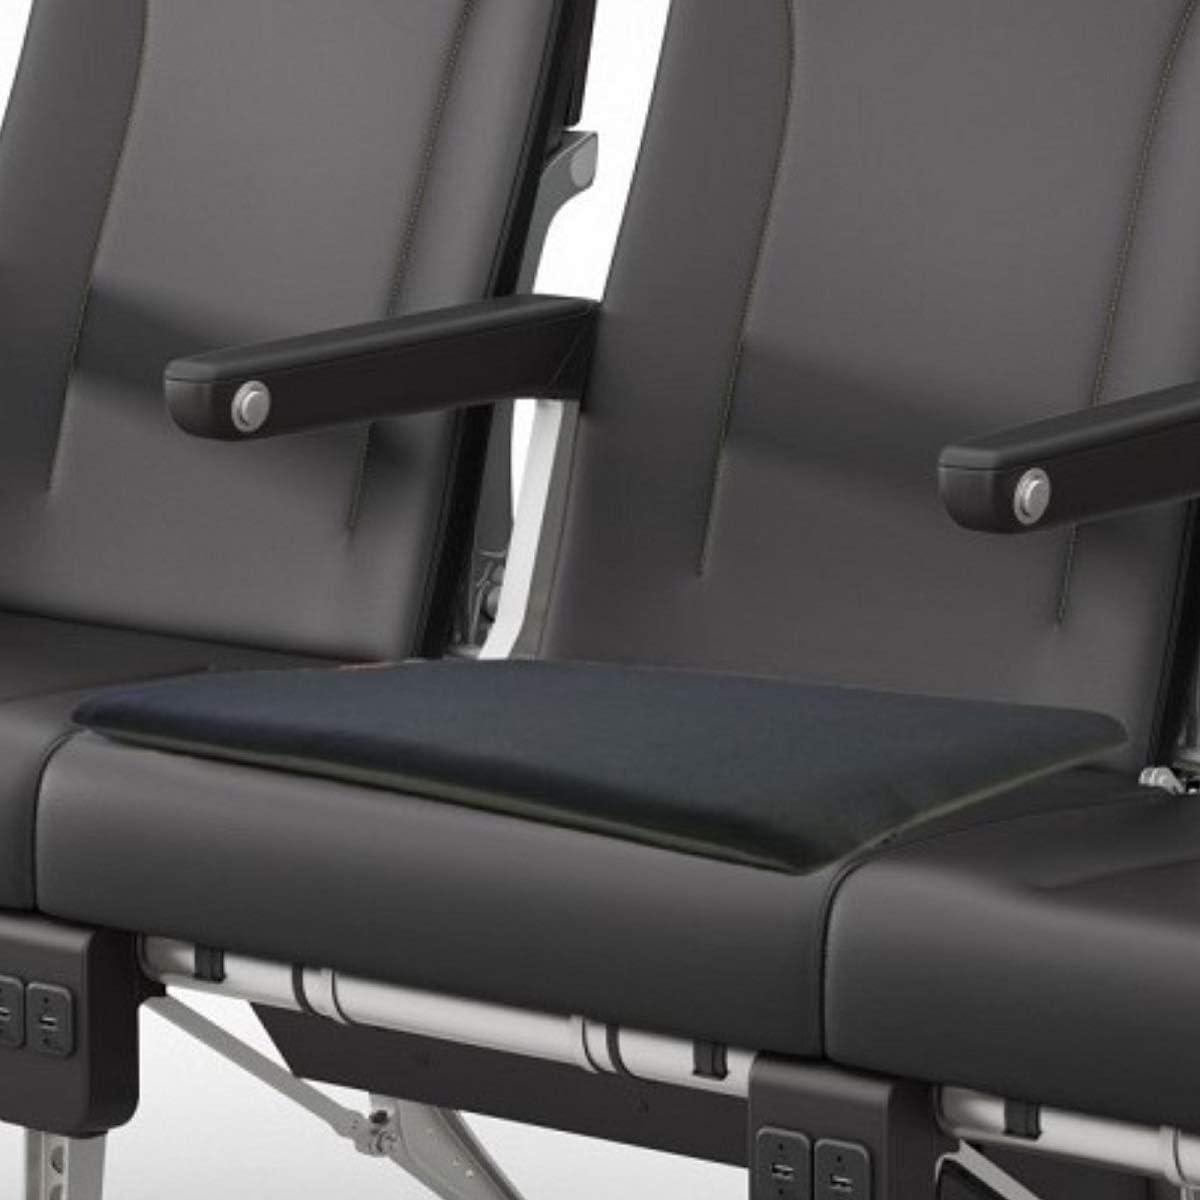 CONFORMAX On The Go New item Gel Cushion- Travel sale Standar Seat Lightweight